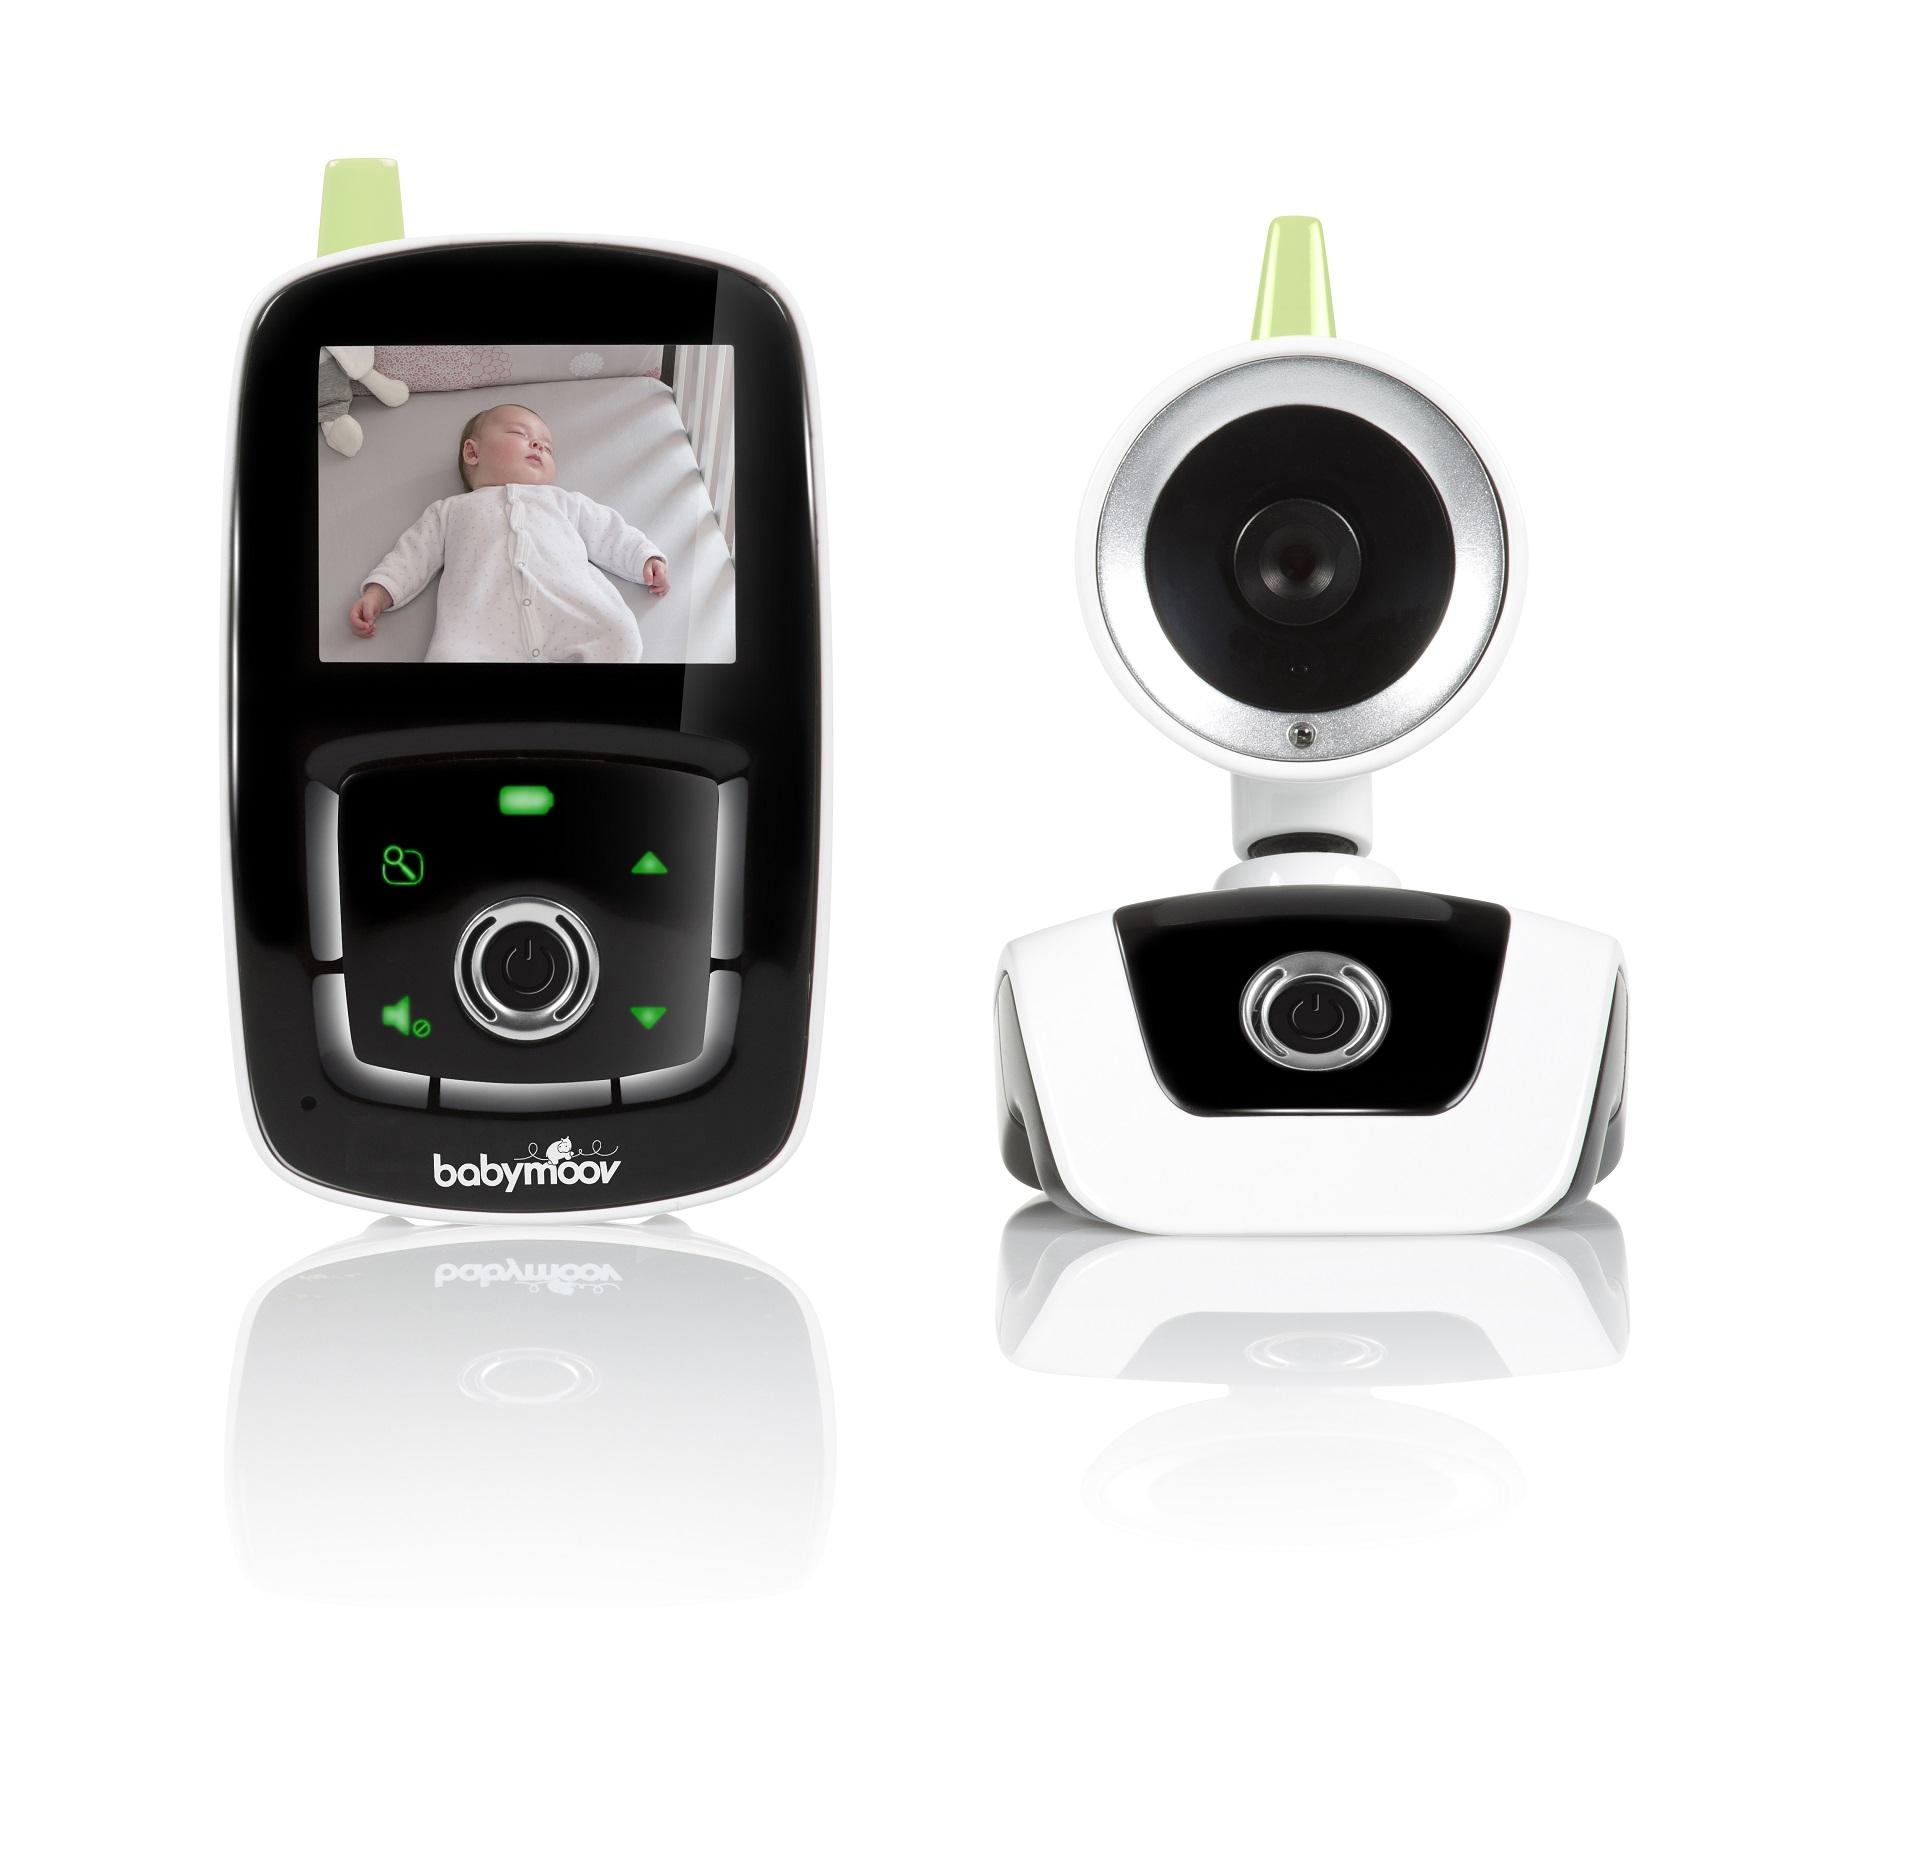 Babymoov Visio Care III Baby Monitor - Buy at kidsroom